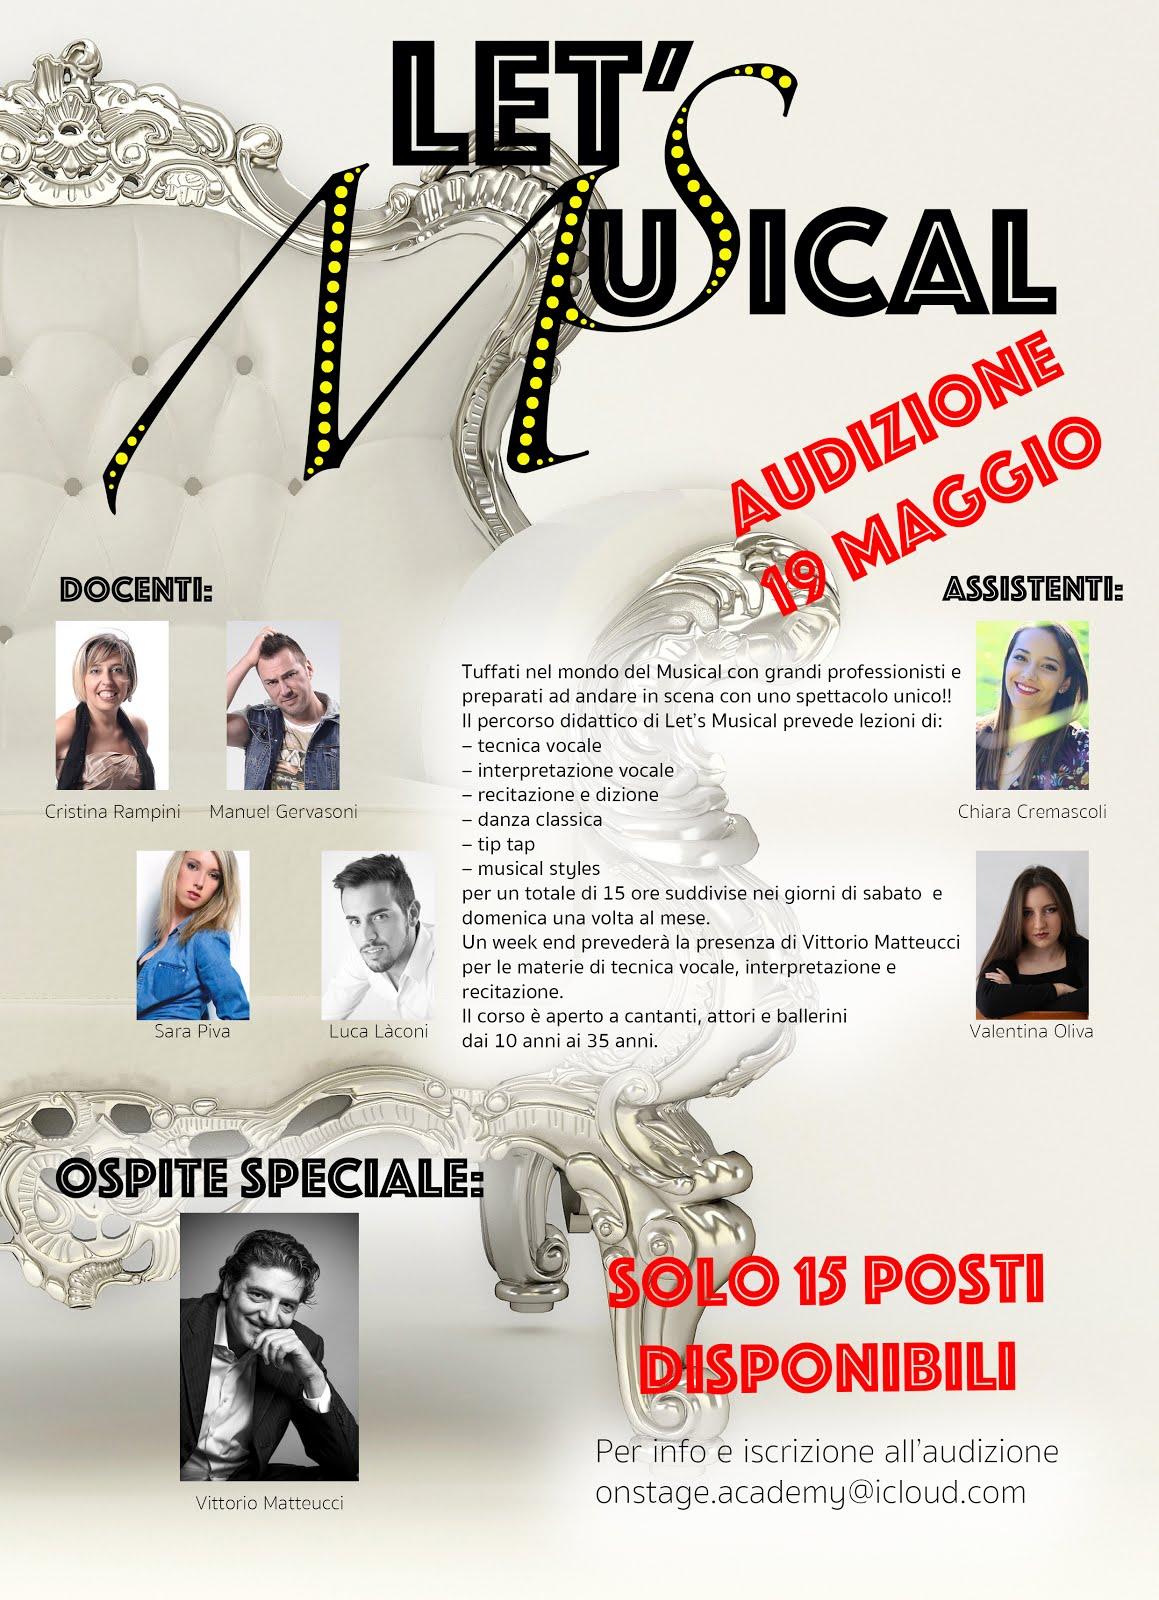 LET'S MUSICAL! PERCORSO DIDATTICO